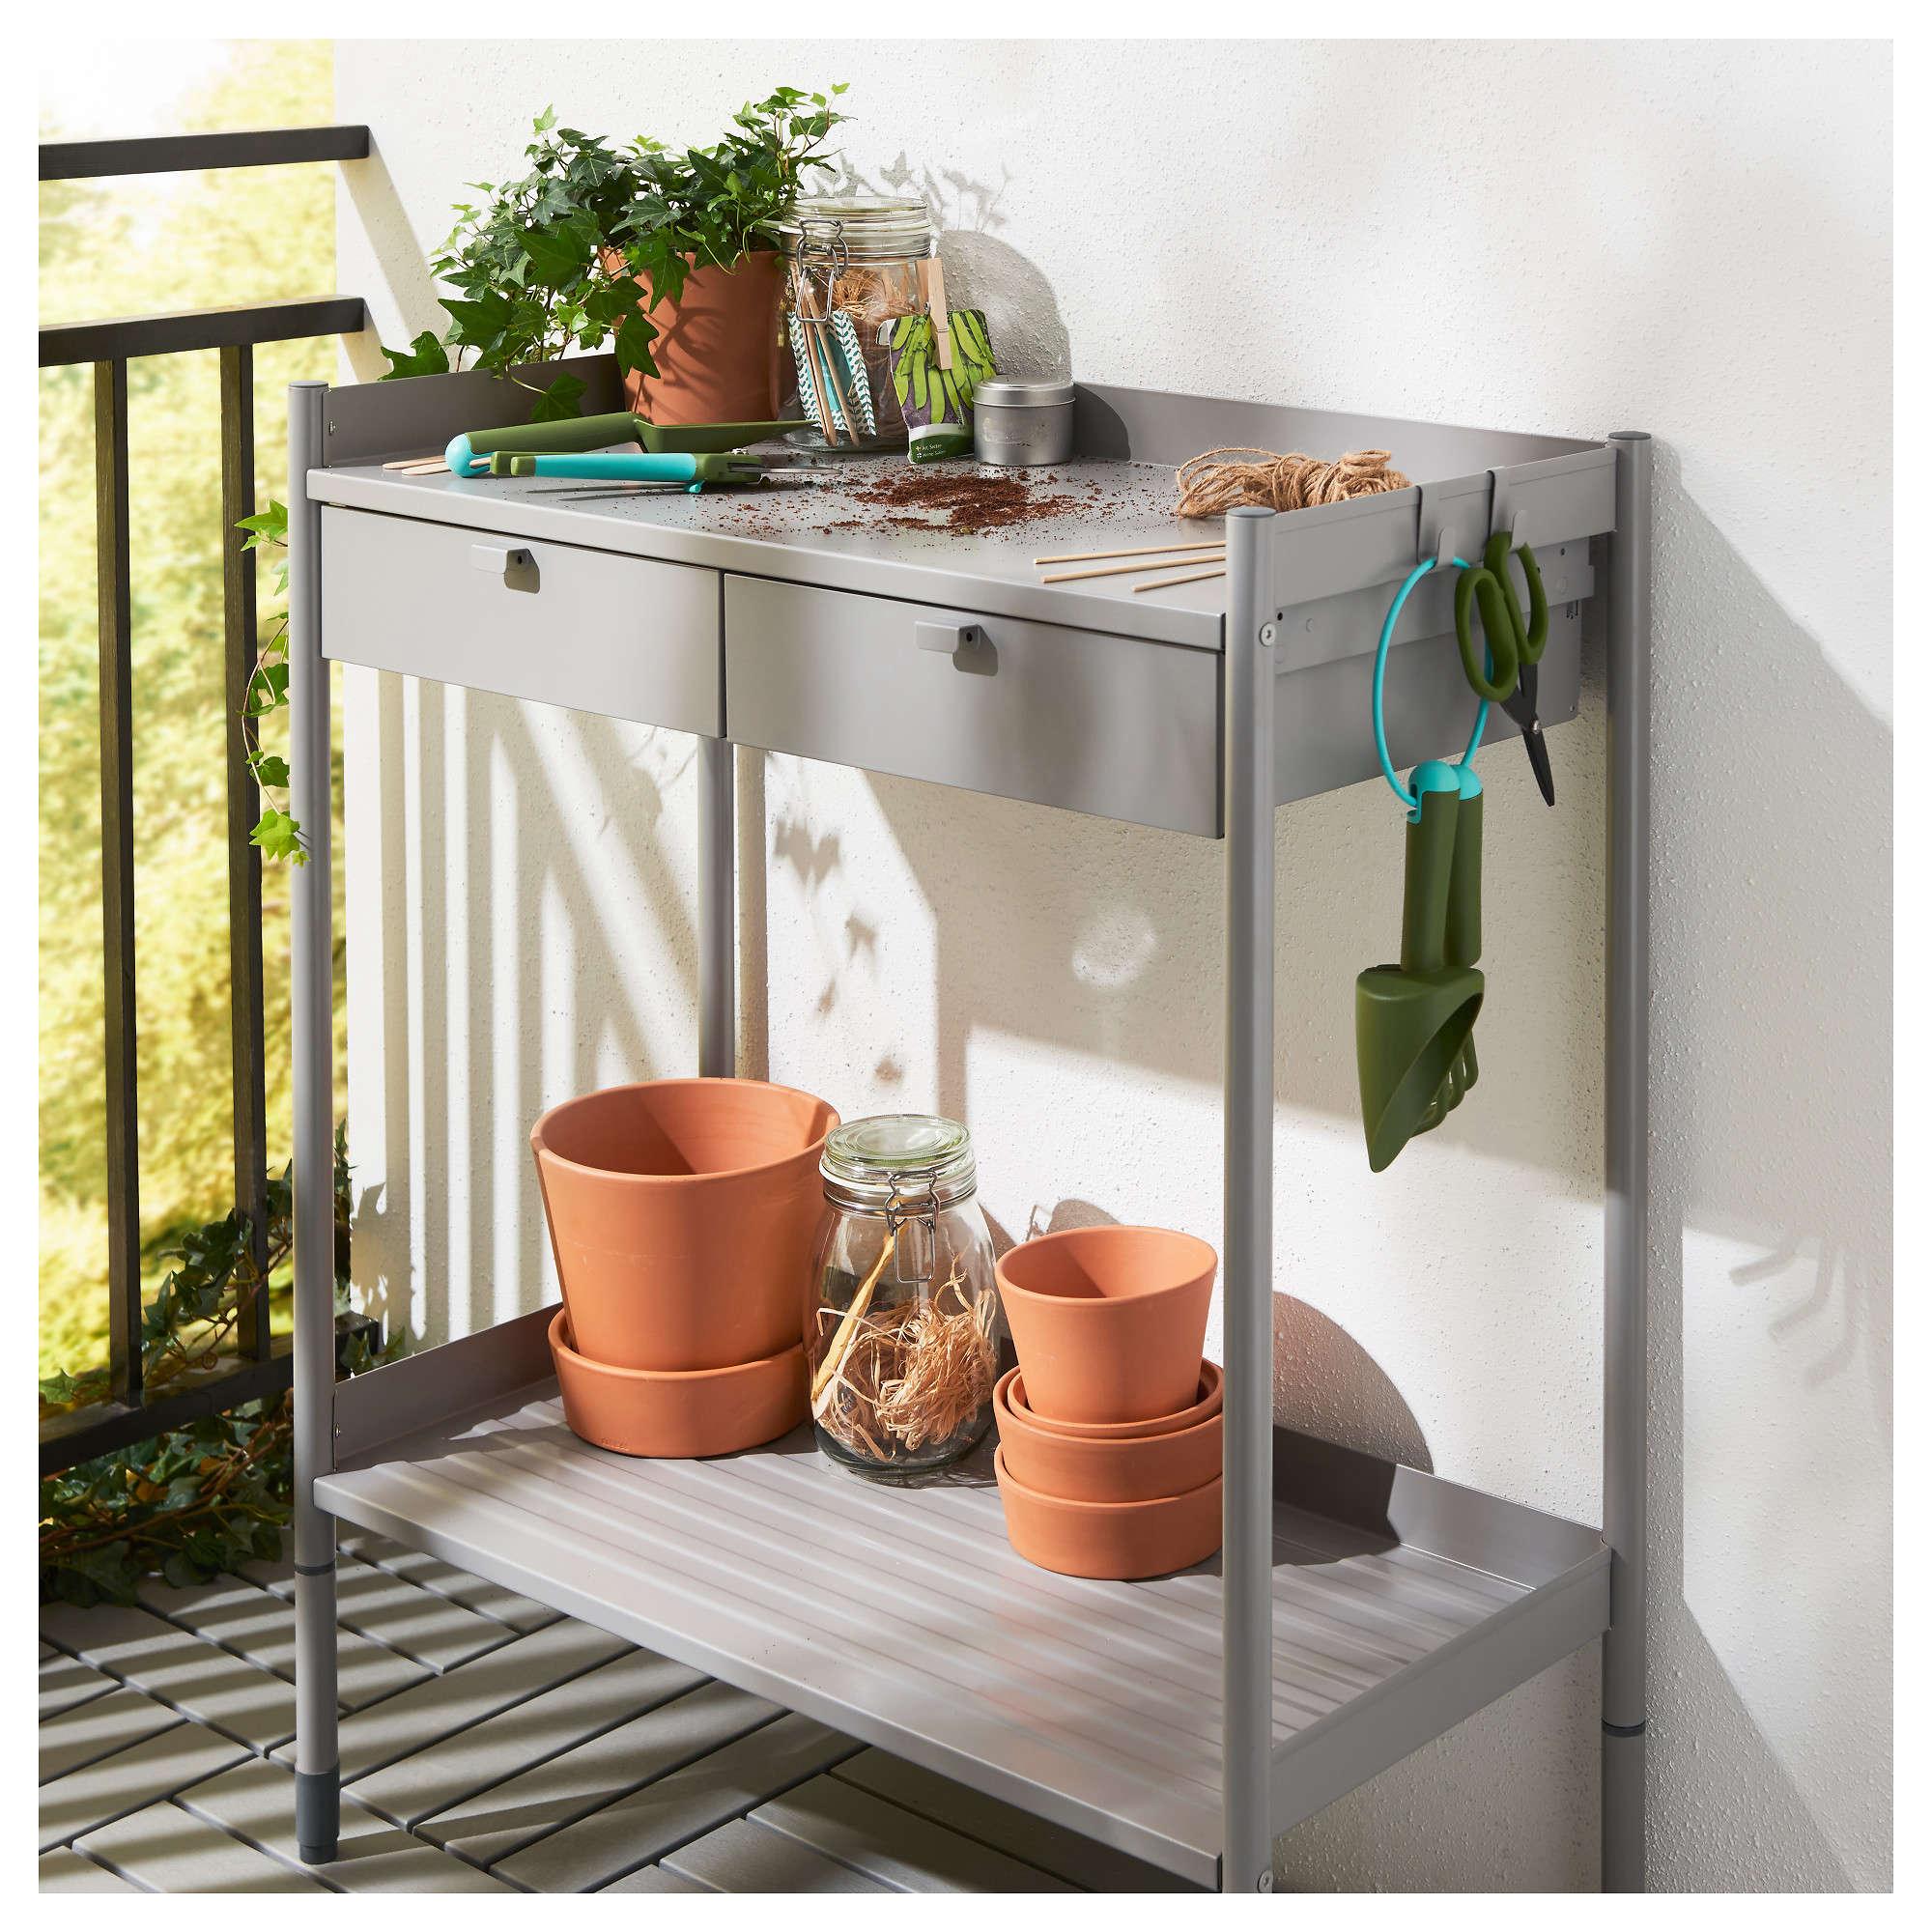 Hind potting bench gardenista - Ikea muebles jardin 2017 ...